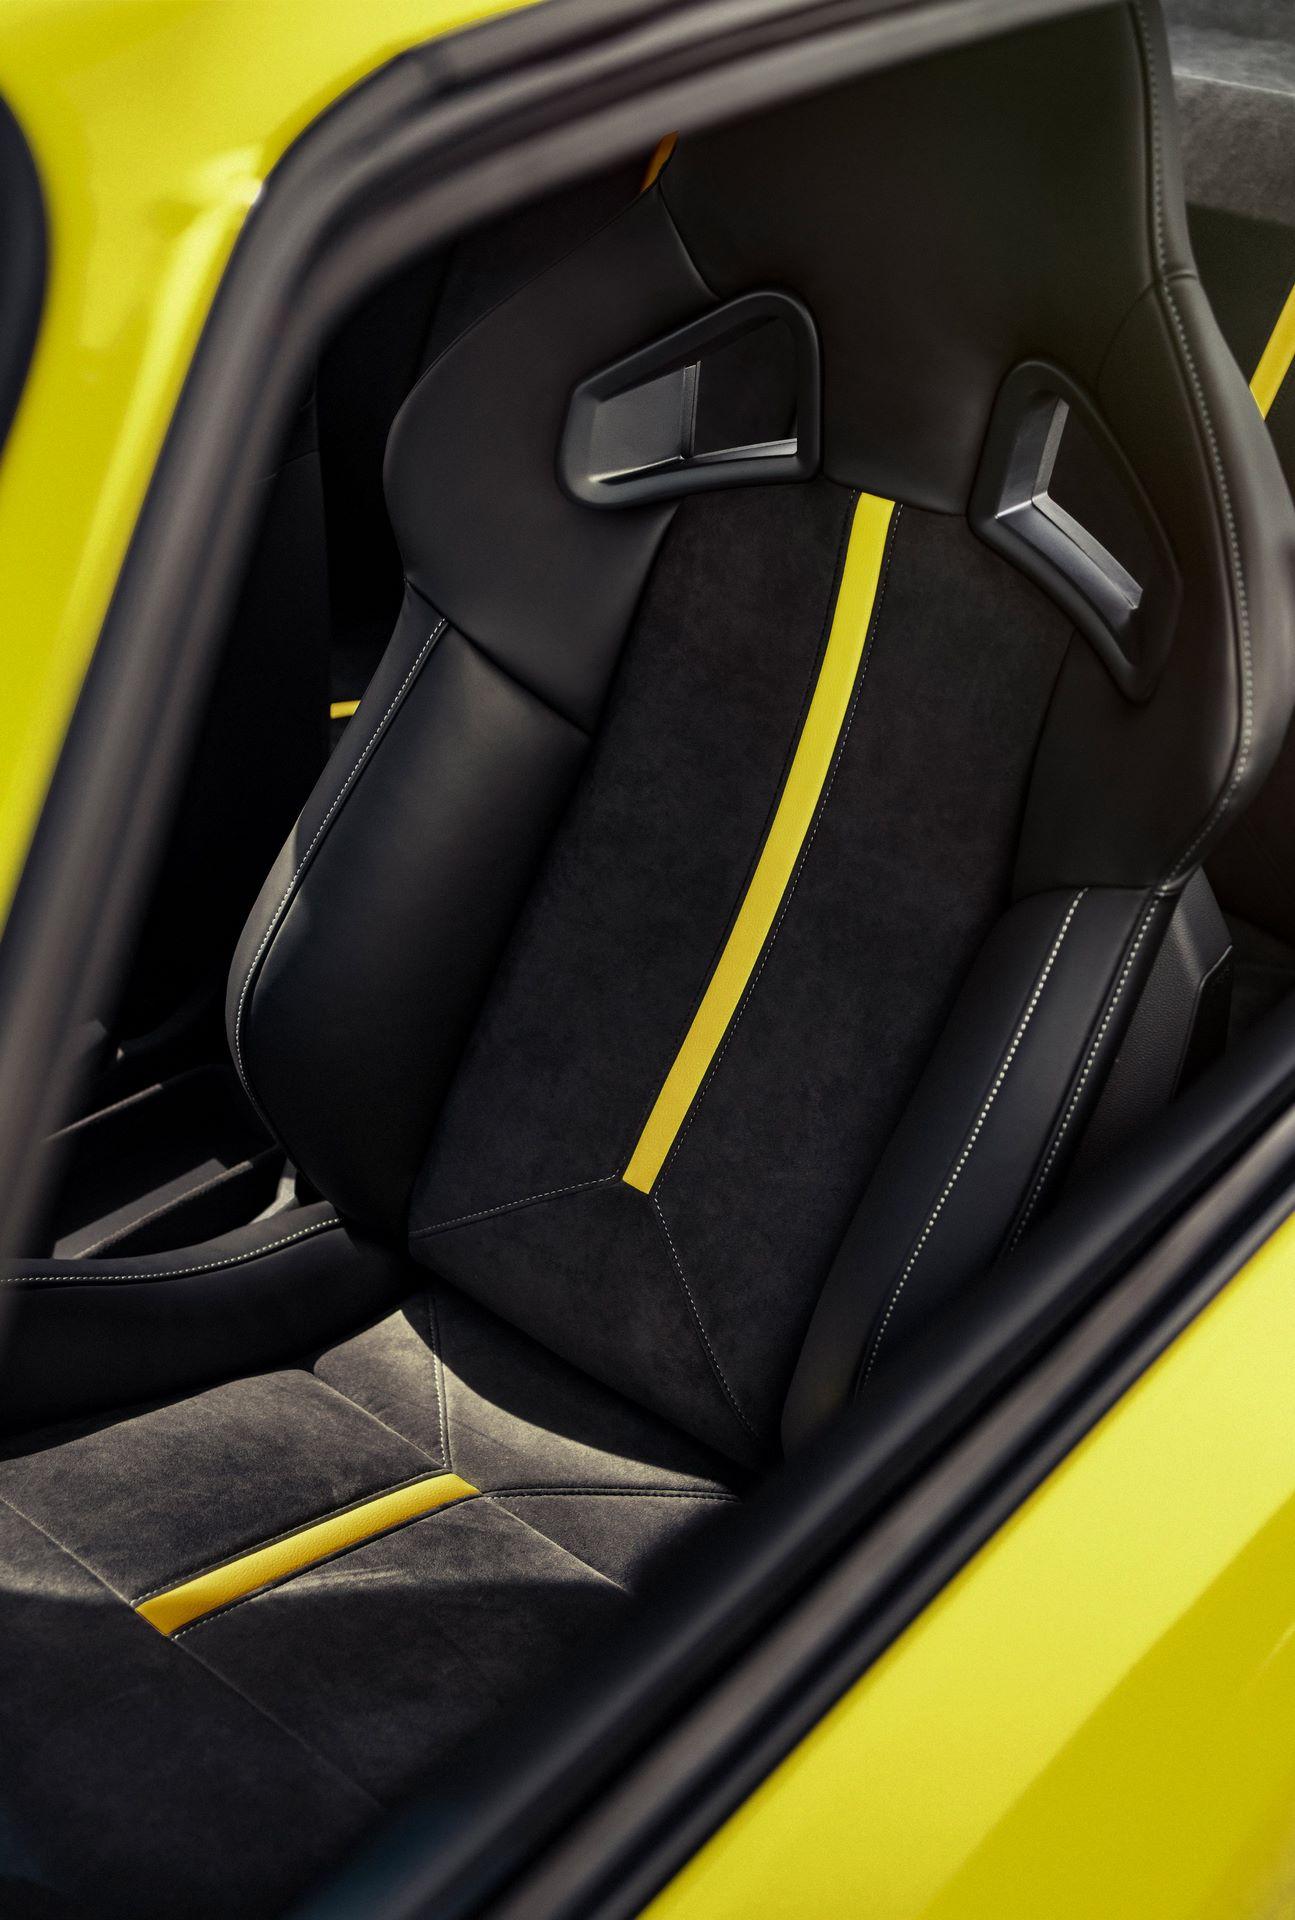 Opel-Manta-GSe-ElektroMOD-11